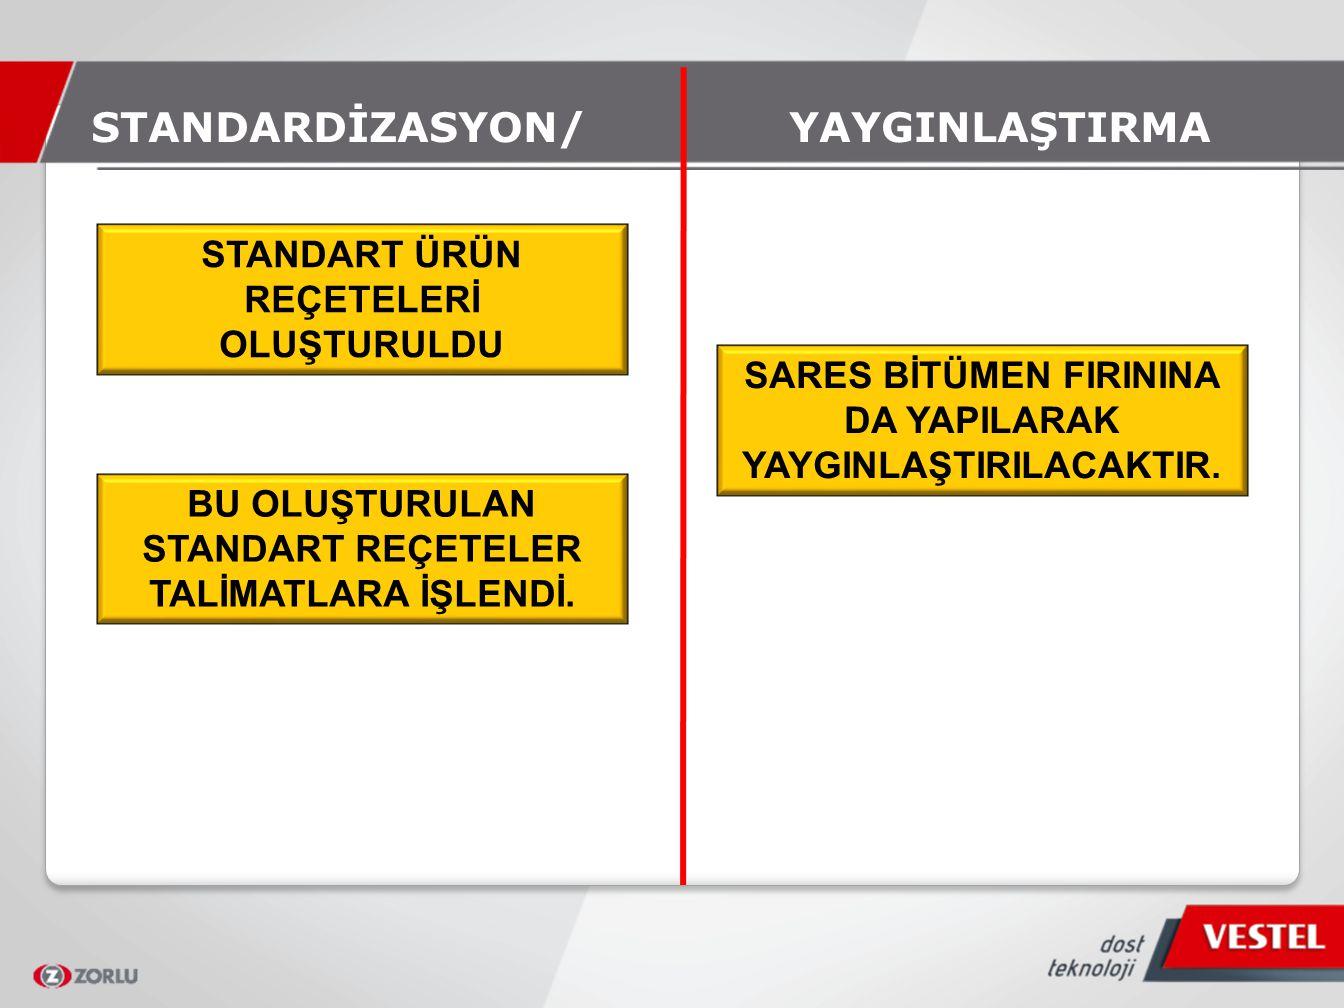 STANDARDİZASYON/ YAYGINLAŞTIRMA